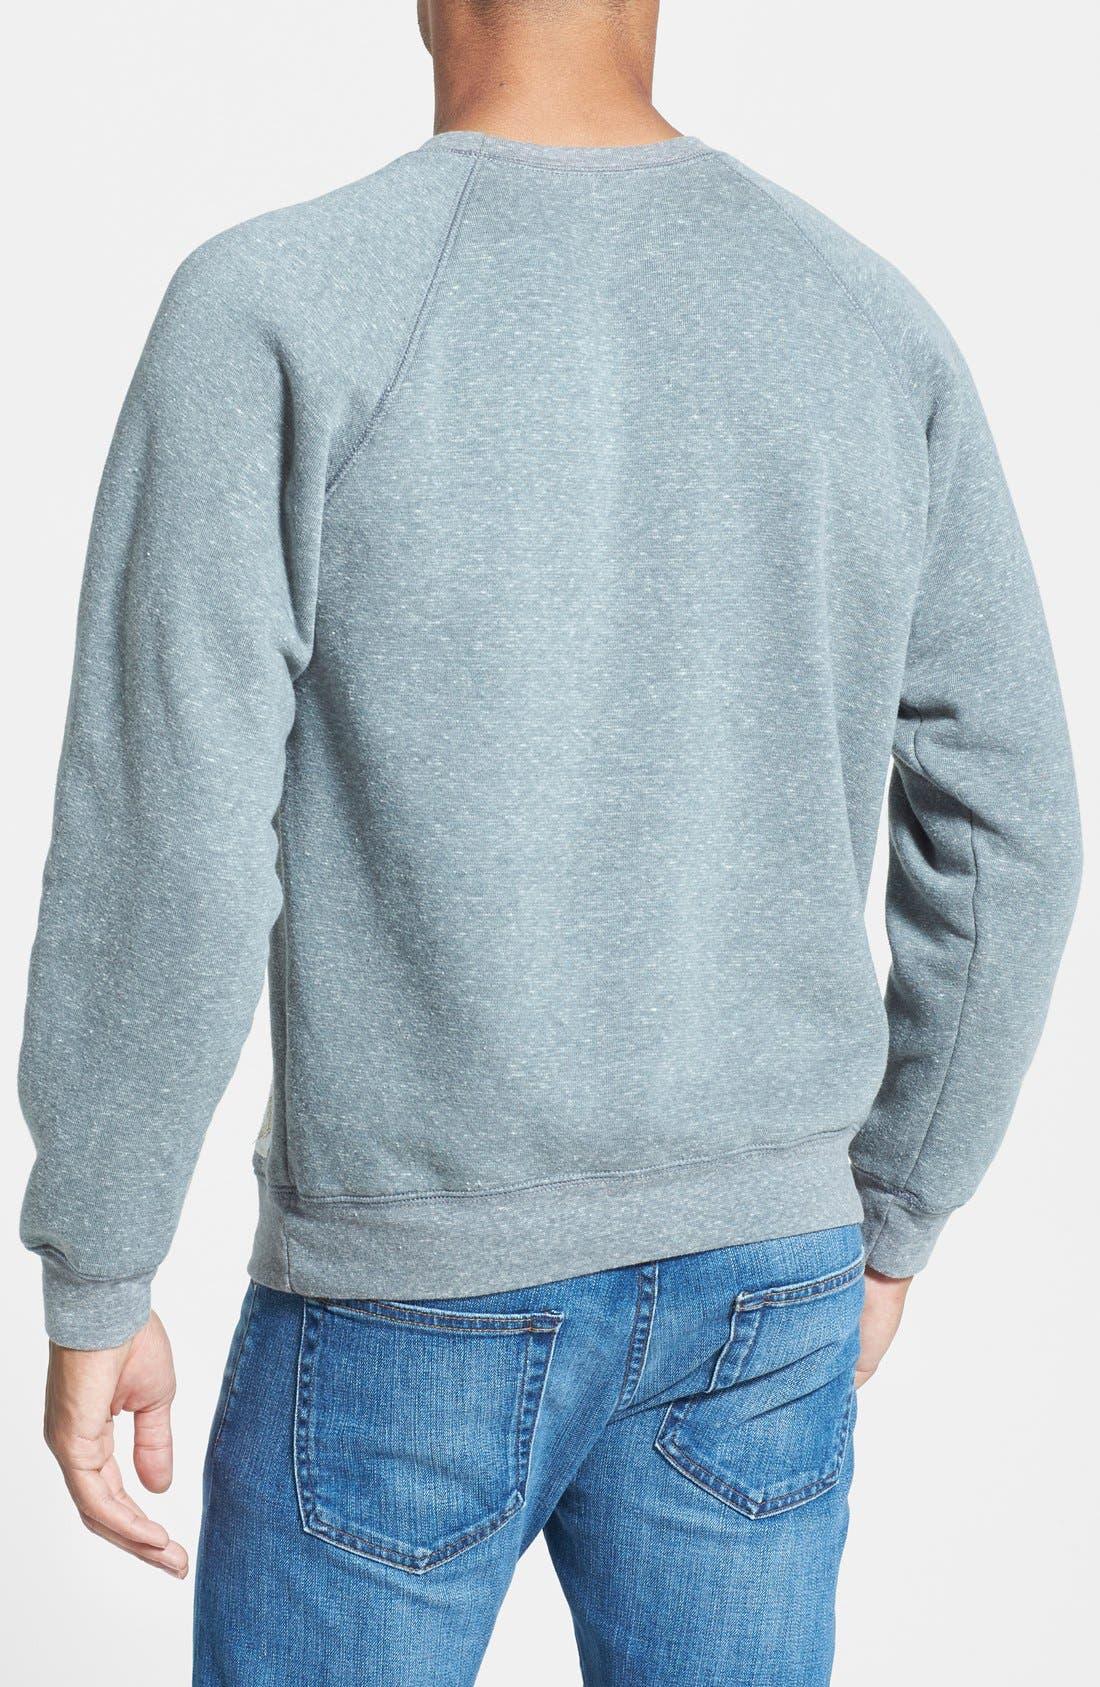 Alternate Image 2  - Retro Brand 'Michigan State Spartans Football' Slim Fit Raglan Crewneck Sweatshirt